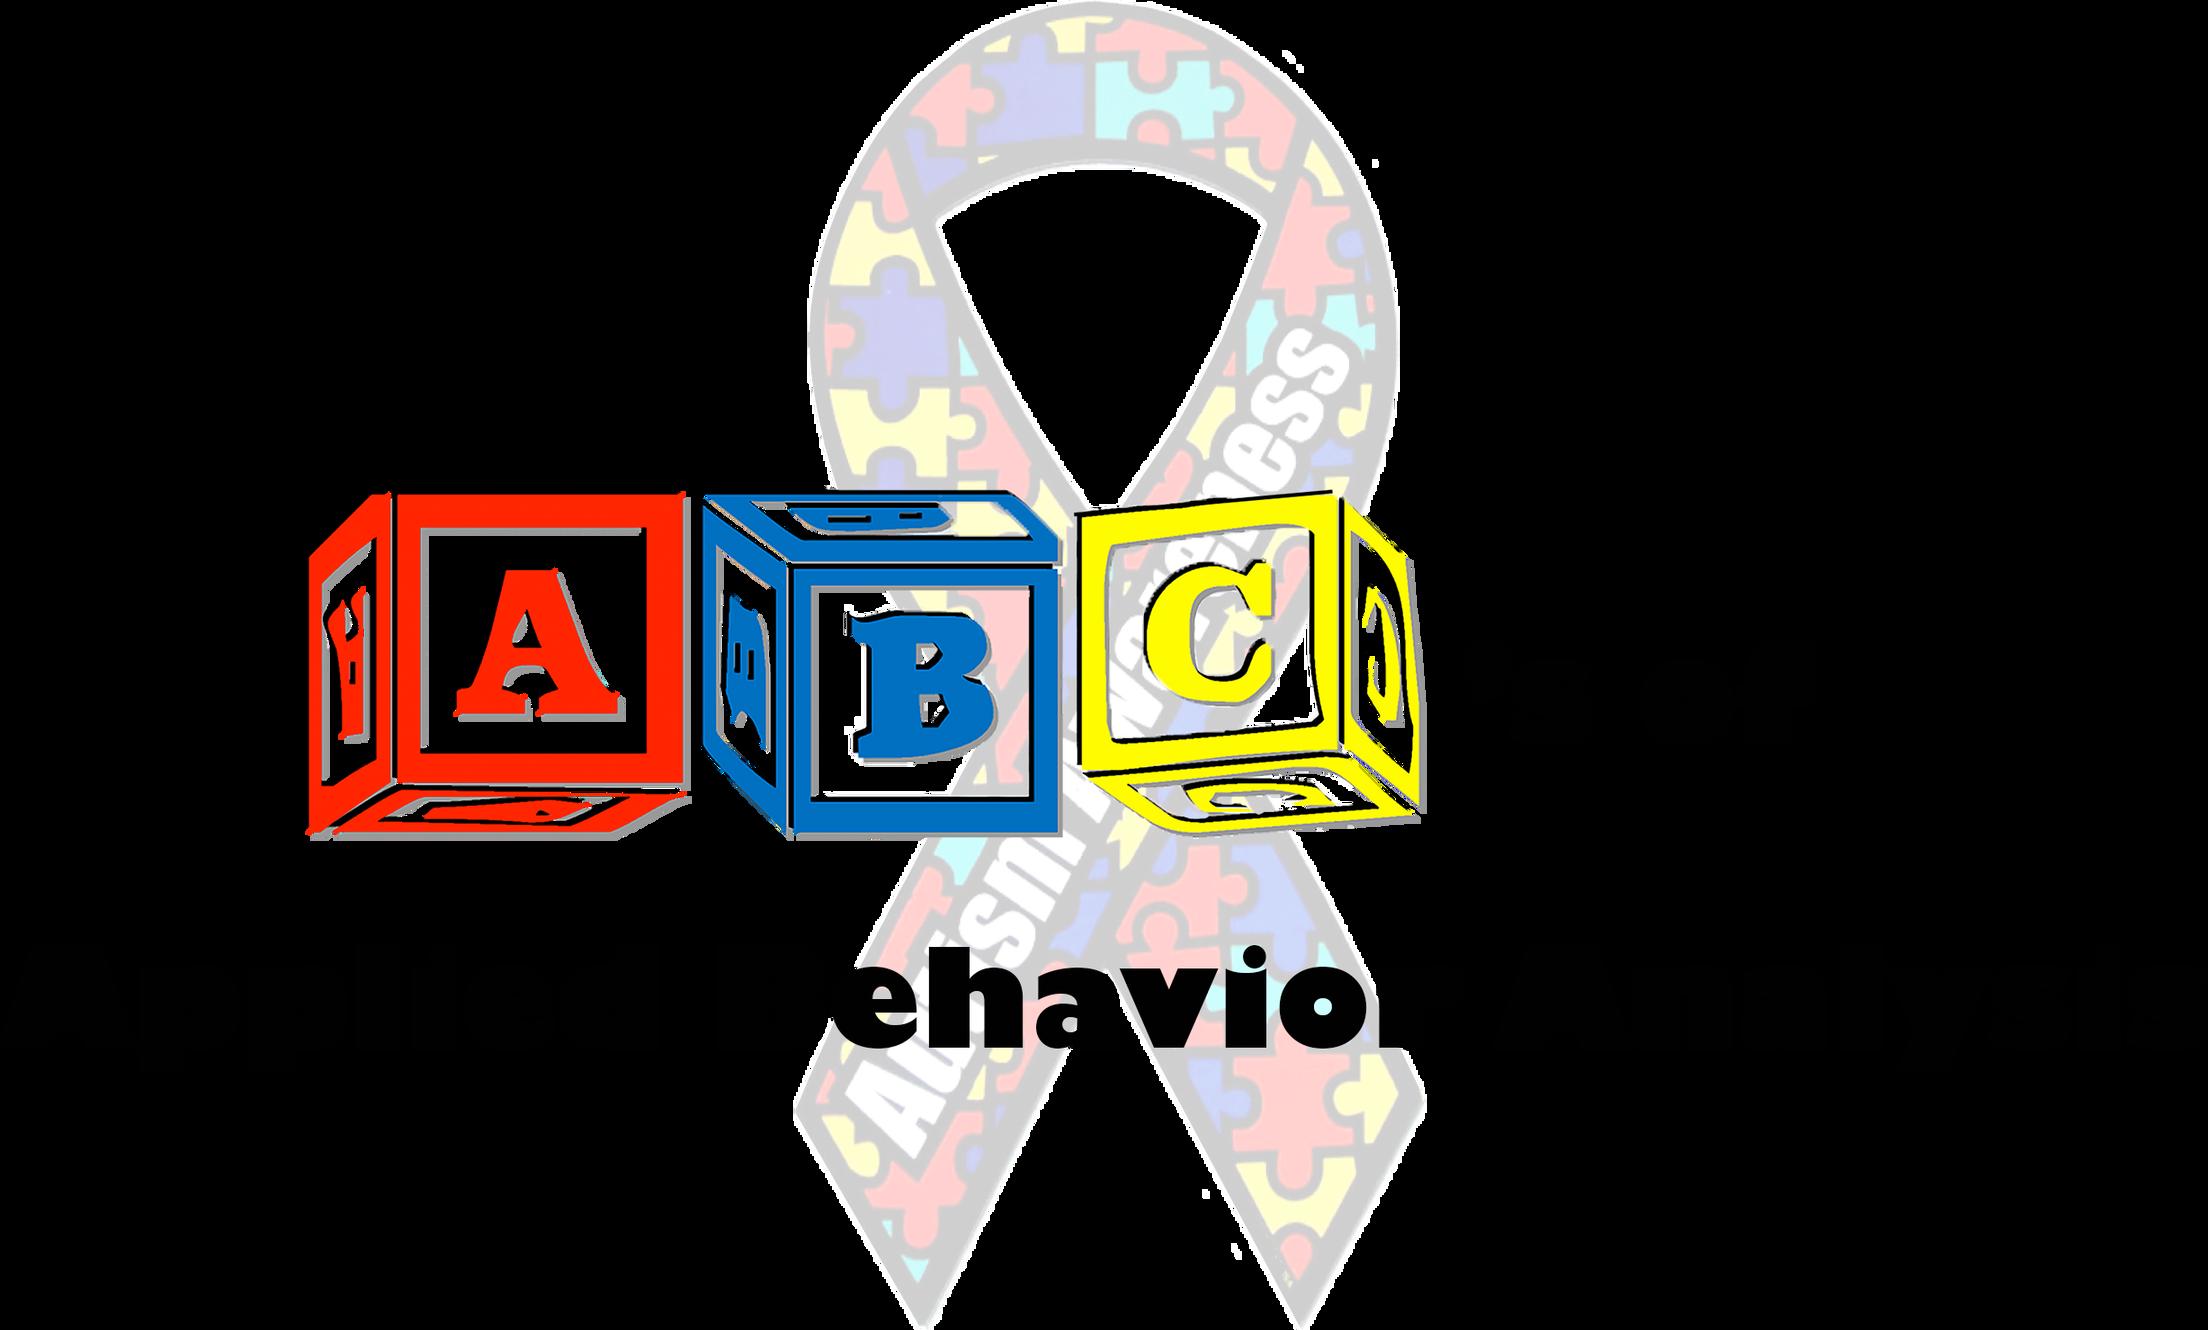 Abc behavior analysis clipart clip library stock ABC\'S of Applied Behavior Analysis   Salem, VA   Autism Services clip library stock